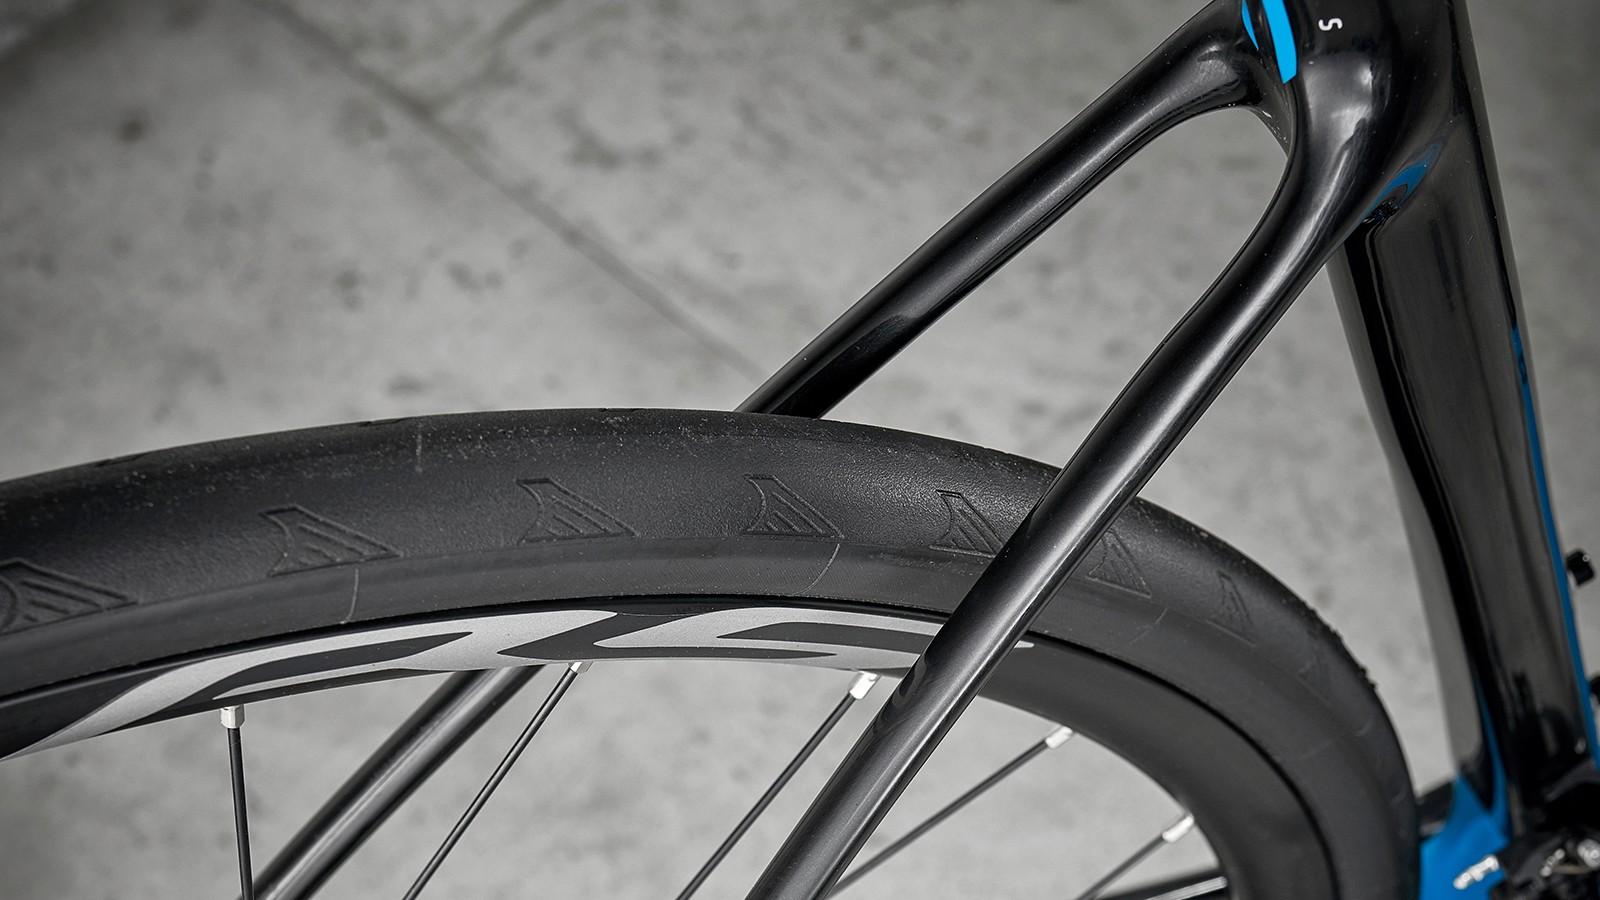 Shimano's RS170 disc wheels